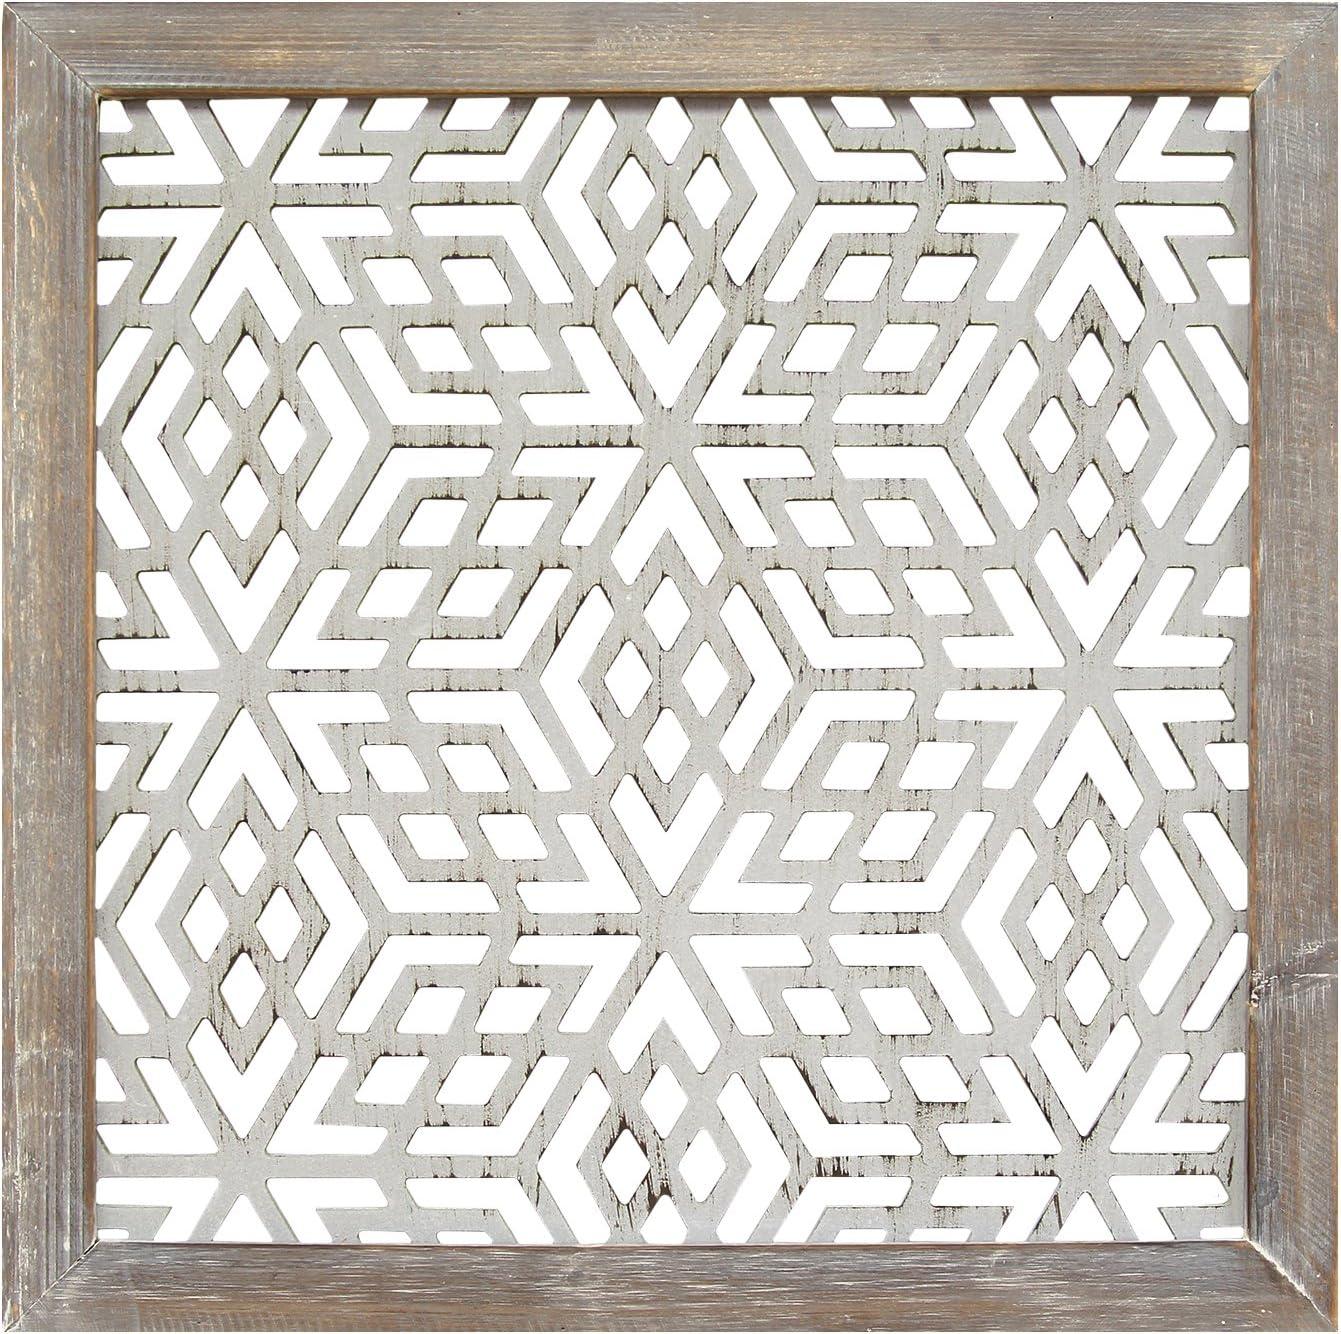 Stratton Home Decor S01939 1 Piece Framed Laser-Cut Wall Decor, 16.00 W x 1.00 D x 16.00 H, Distressed Grey